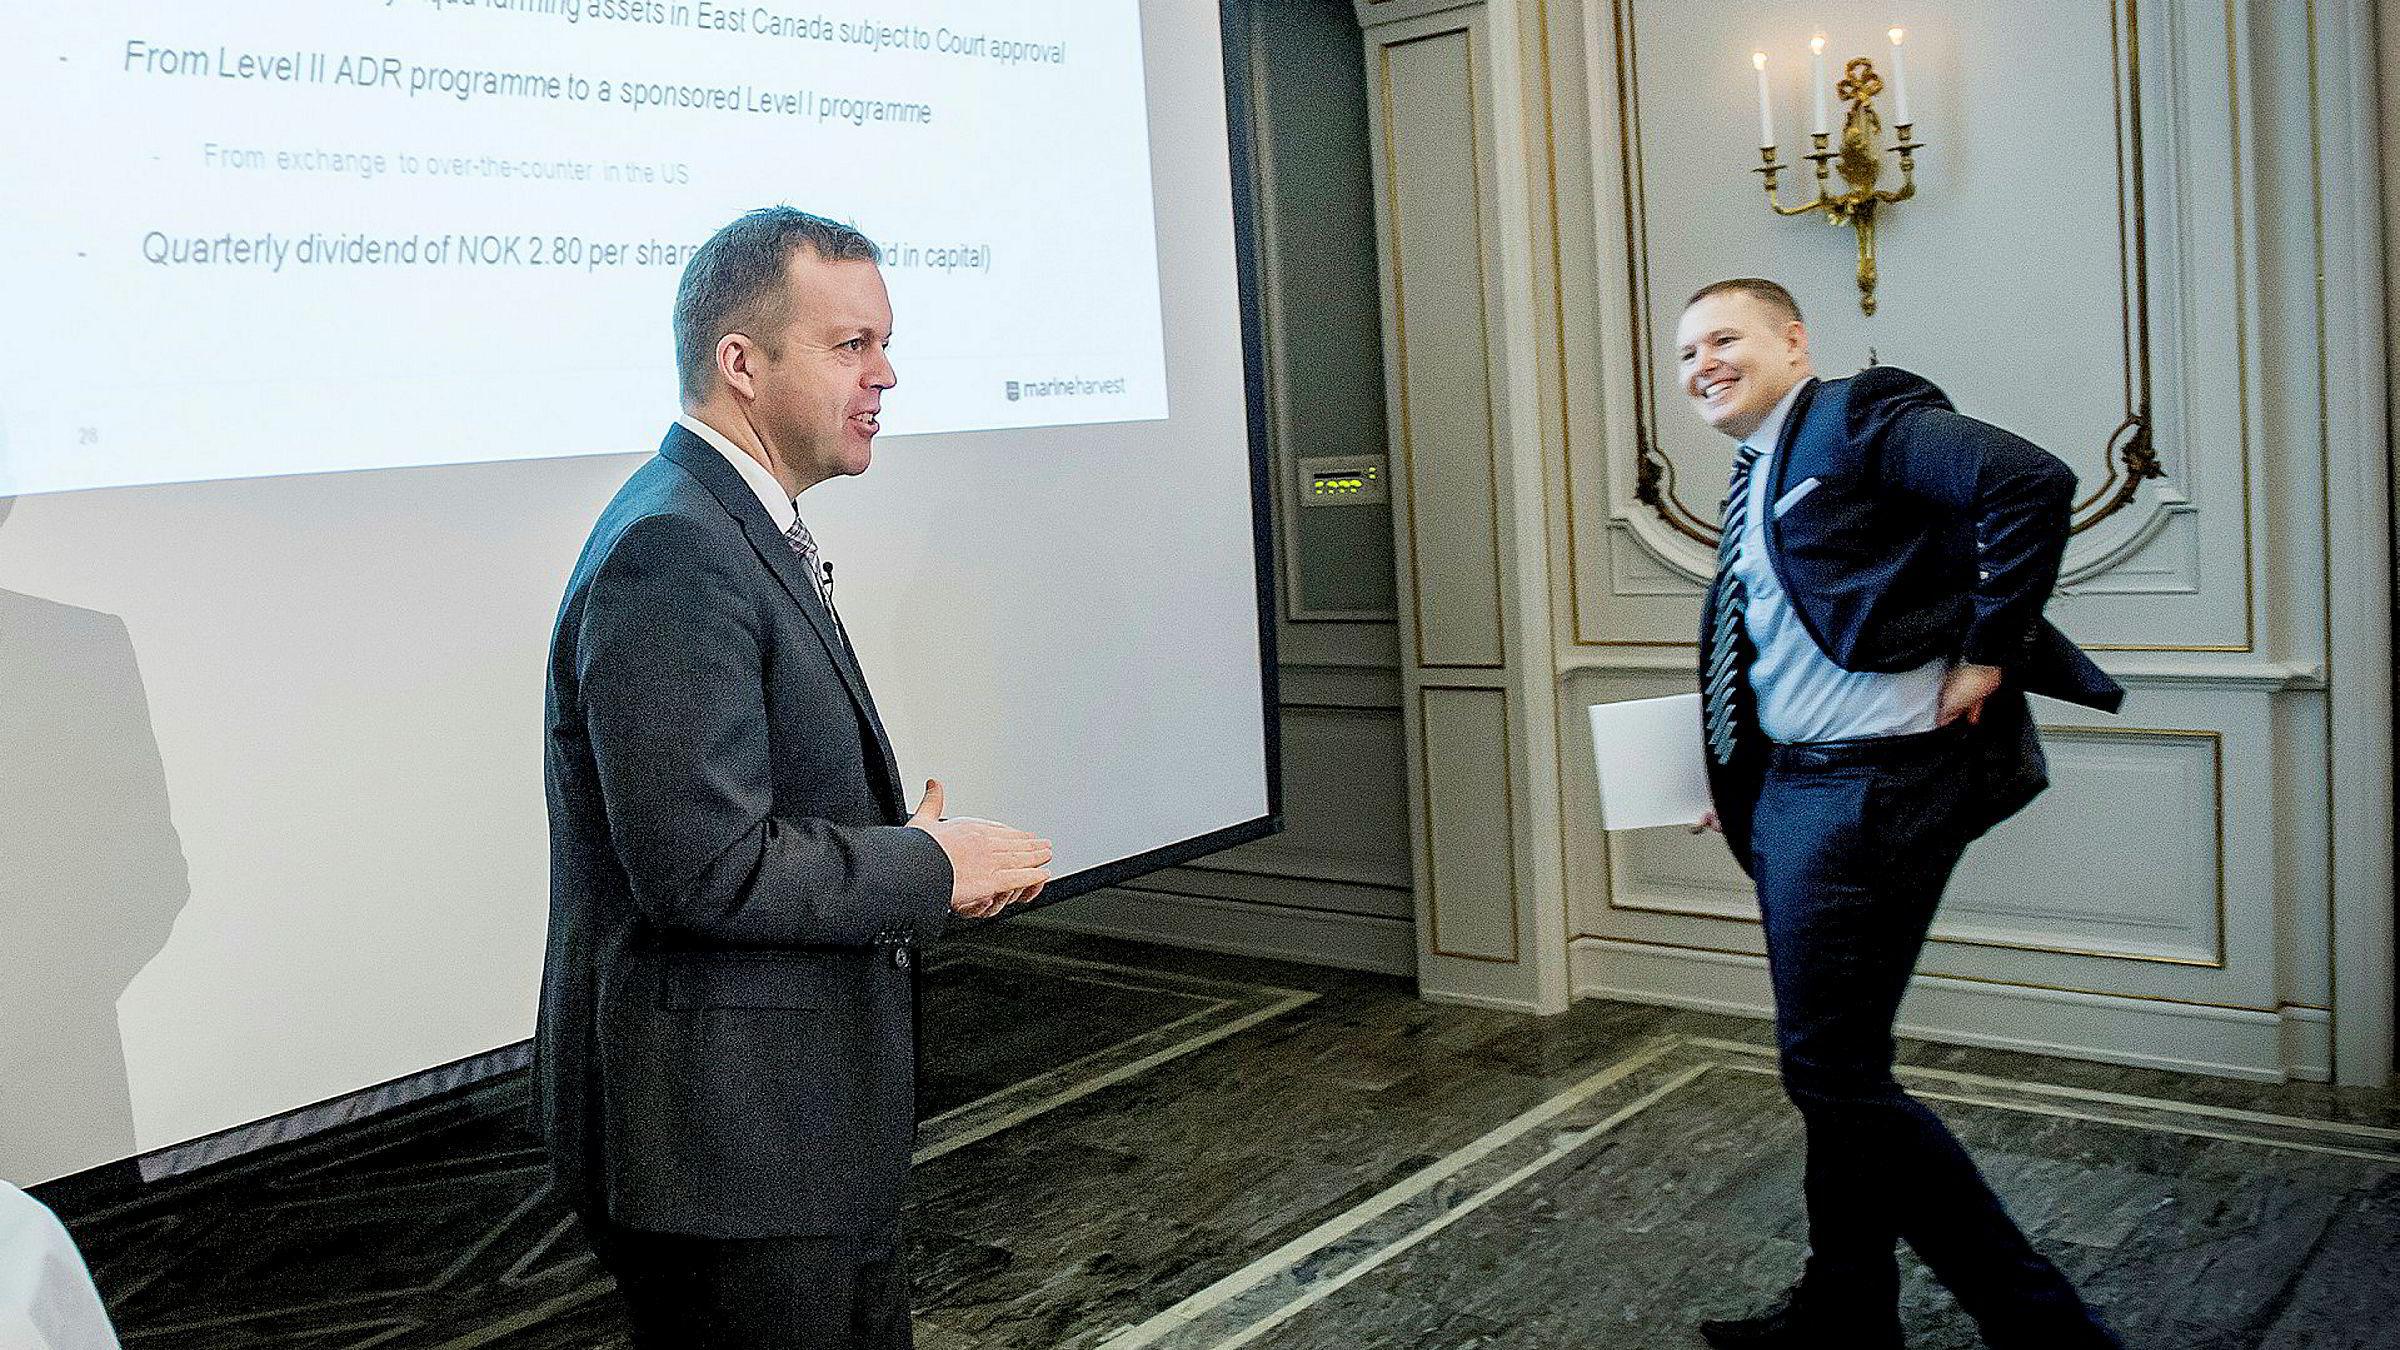 Tidligere konsernsjef Alf-Helge Aarskog (til venstre) i Mowi og påtroppende sjef Ivan Vindheim under en kvartalstallspresentasjon i Oslo.